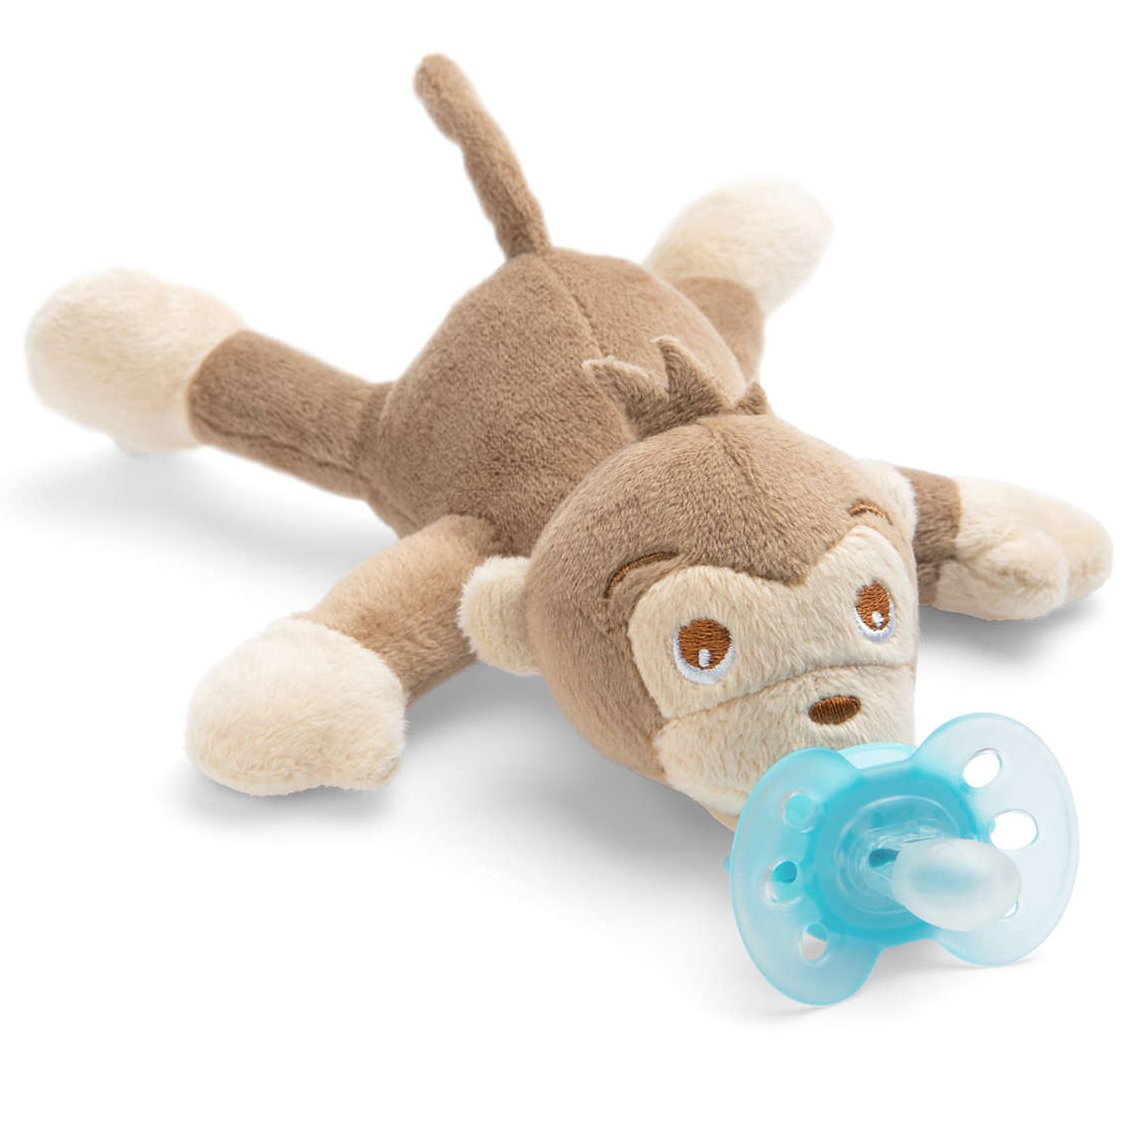 Avent Snuggle Λούτρινο Μαϊμού – Μαλακή Ορθοδοντική Πιπίλα 0-6 Μηνών SCF348/12